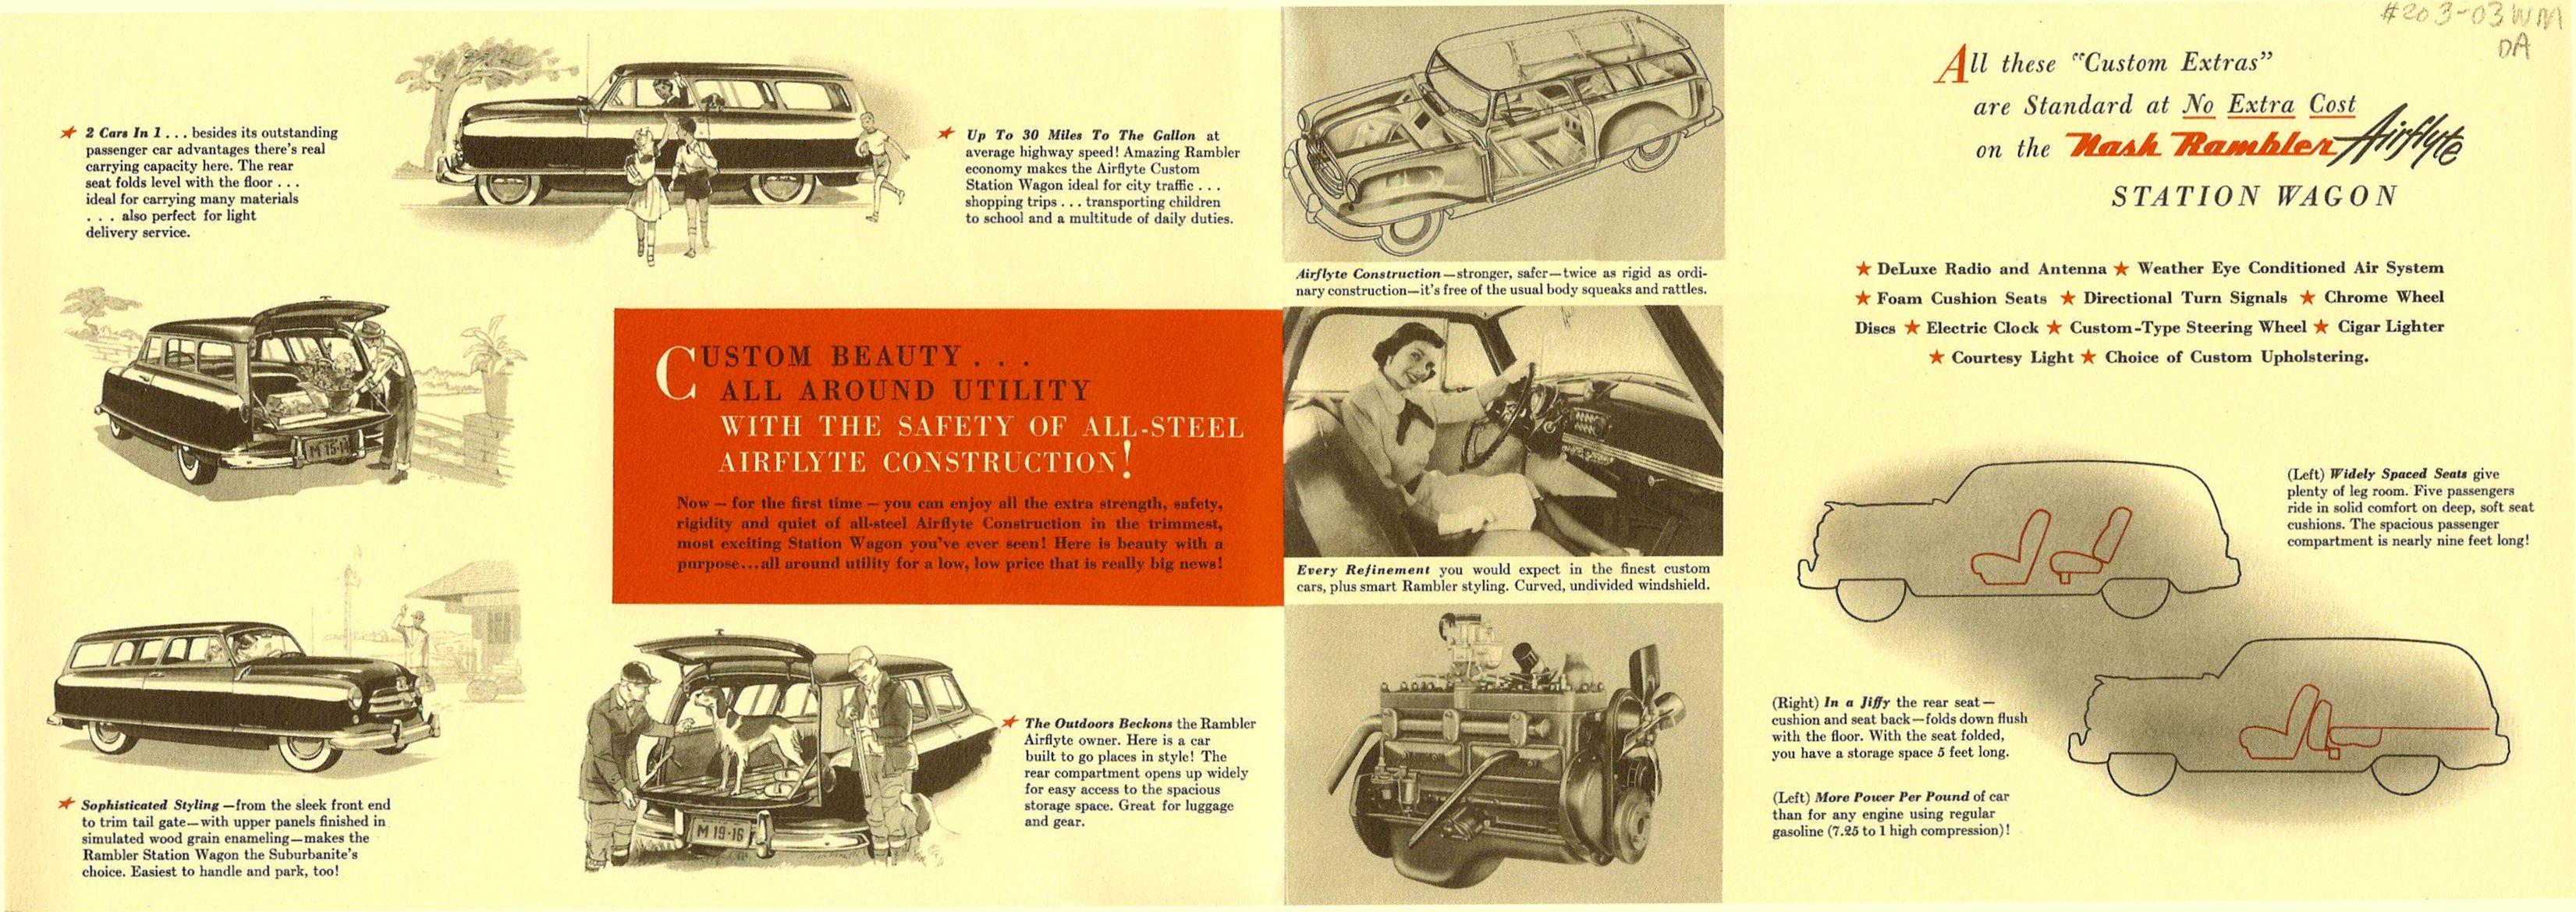 The Nash Rambler Airflyte 1950 America's Lowest-Priced Custom Station Wagon Inside Dated: Jul 17, 1950 Folded: 11″x7.75″ Open: 22″x15.5″ NSP 50-496-100M-5-50